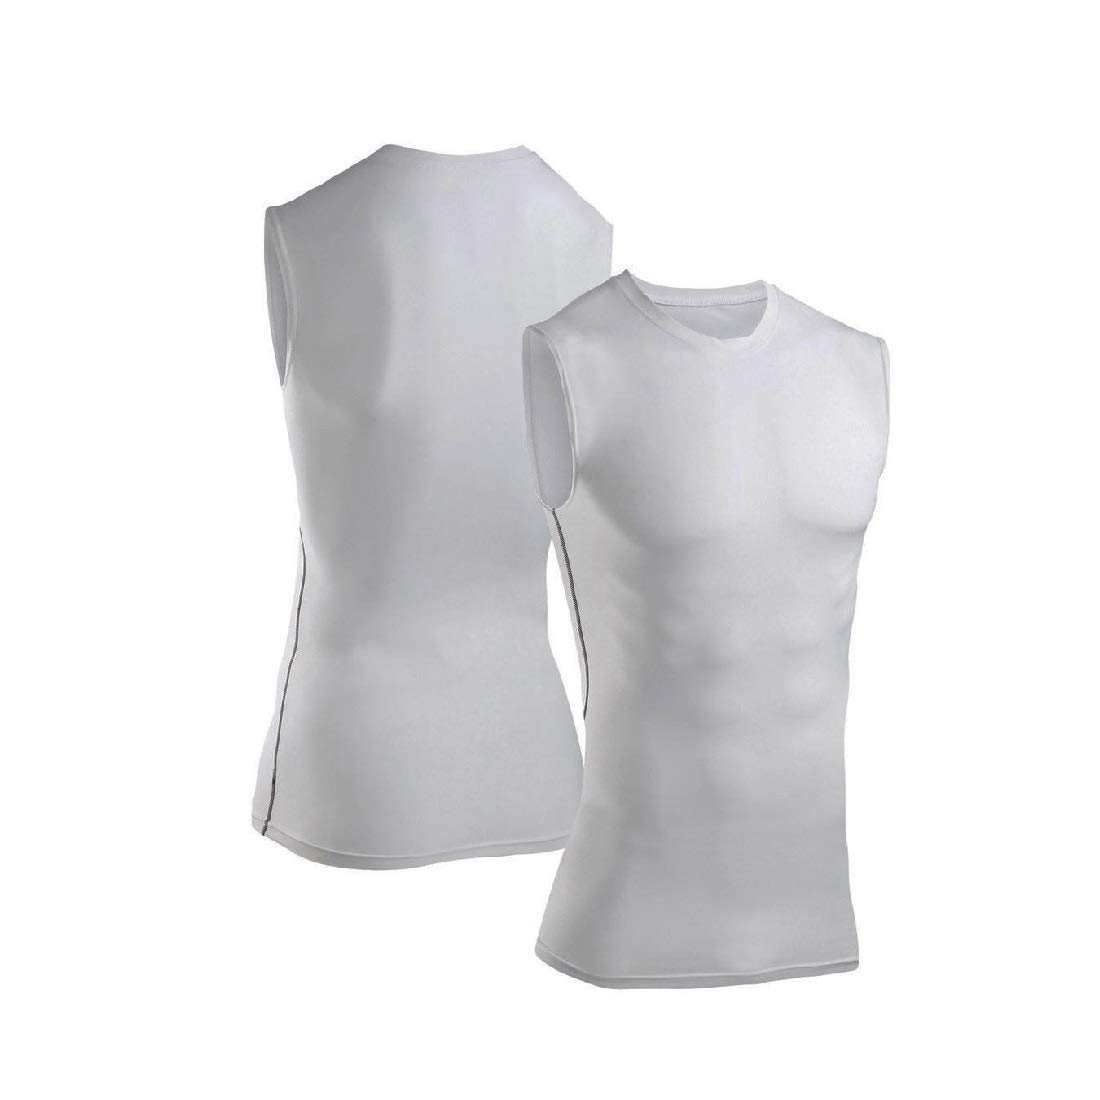 Mens Compression Tank Top Sleeveless Shirt T-Shirt Gym Clothes Base Layer Tights